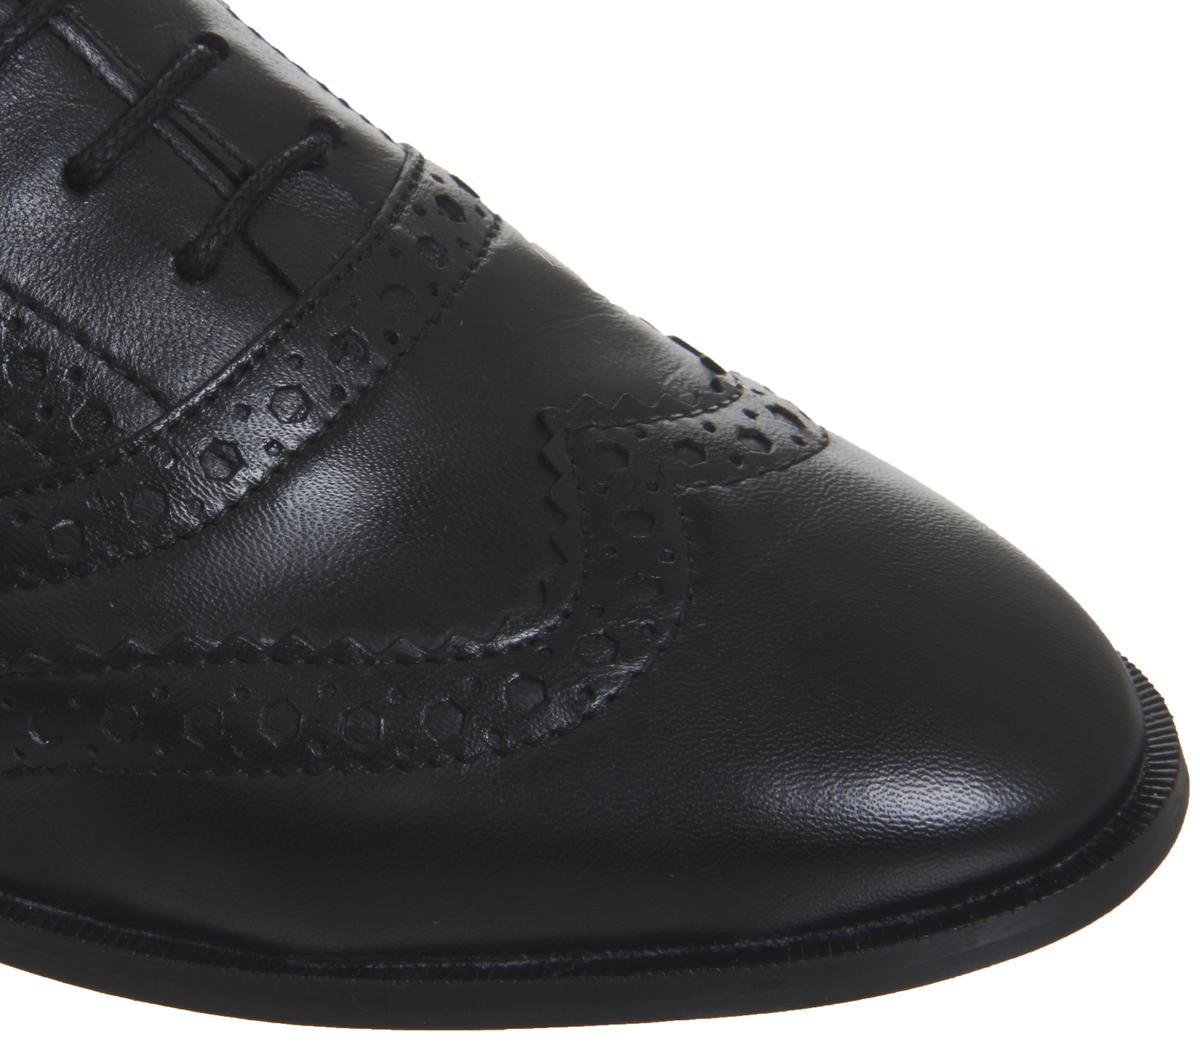 Office Factor Sling Back Peep Toe Flats Black Leather